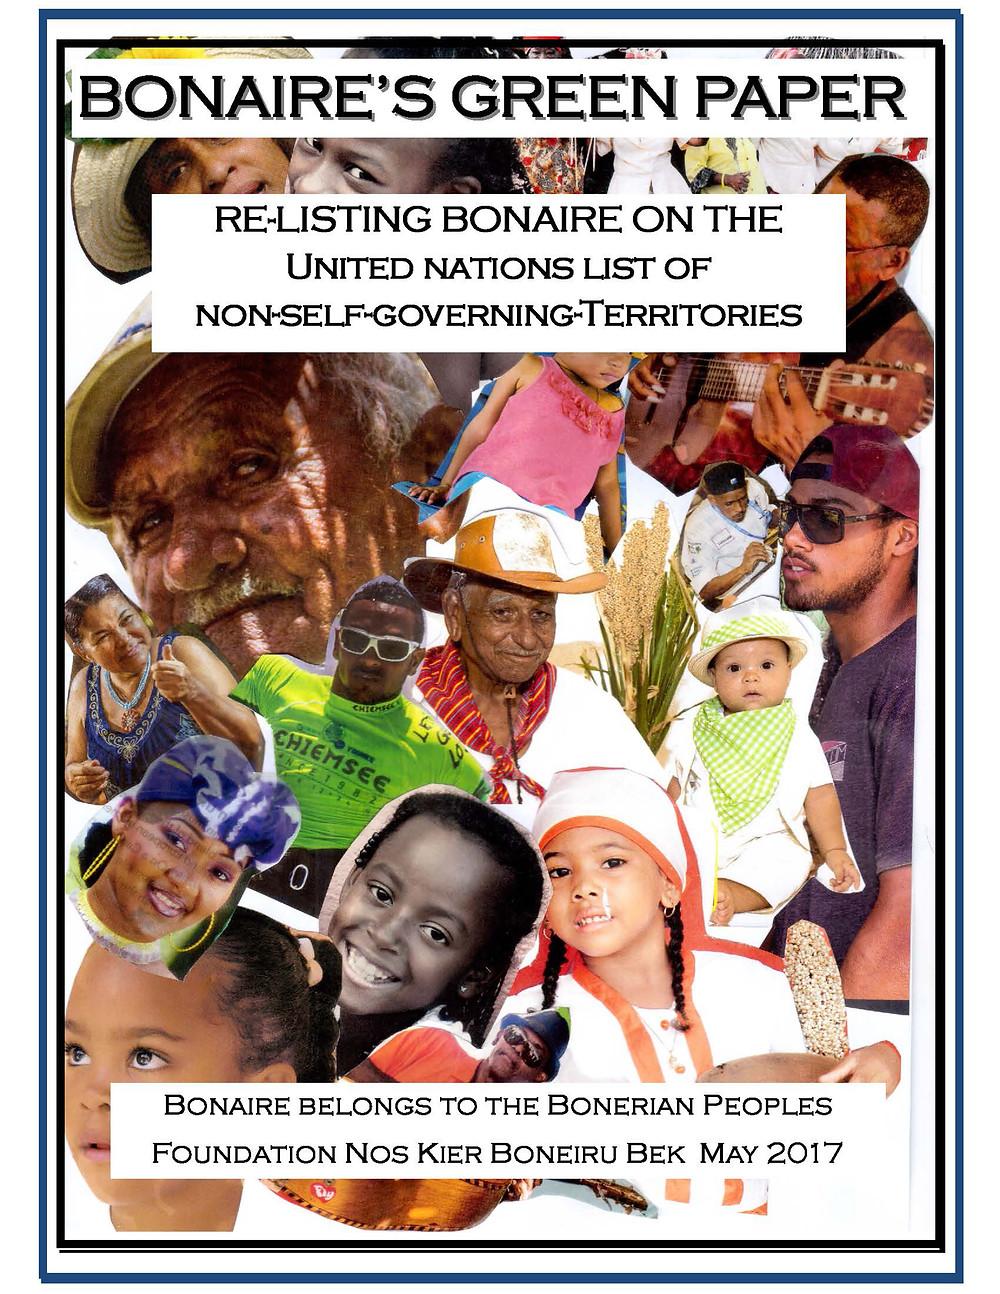 XpBonaire, IslandLife, Bonaire, News, Information, NKBB, Bonaire's Green paper